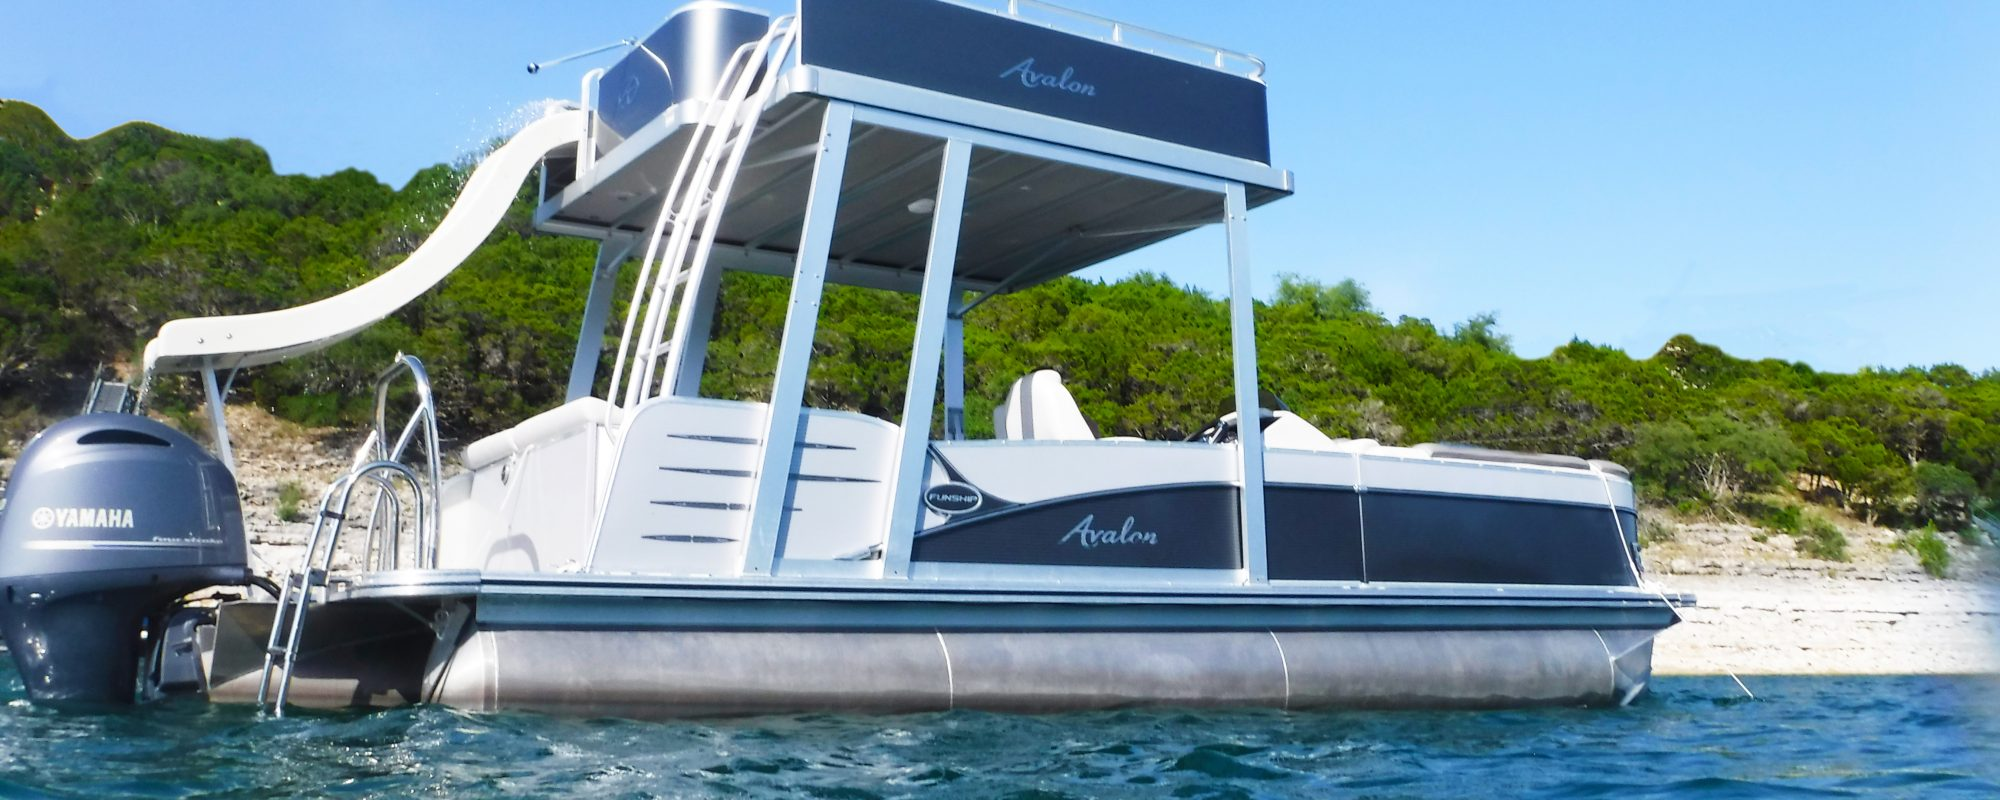 ATX Party Boat - Lake Travis Boat Rentals